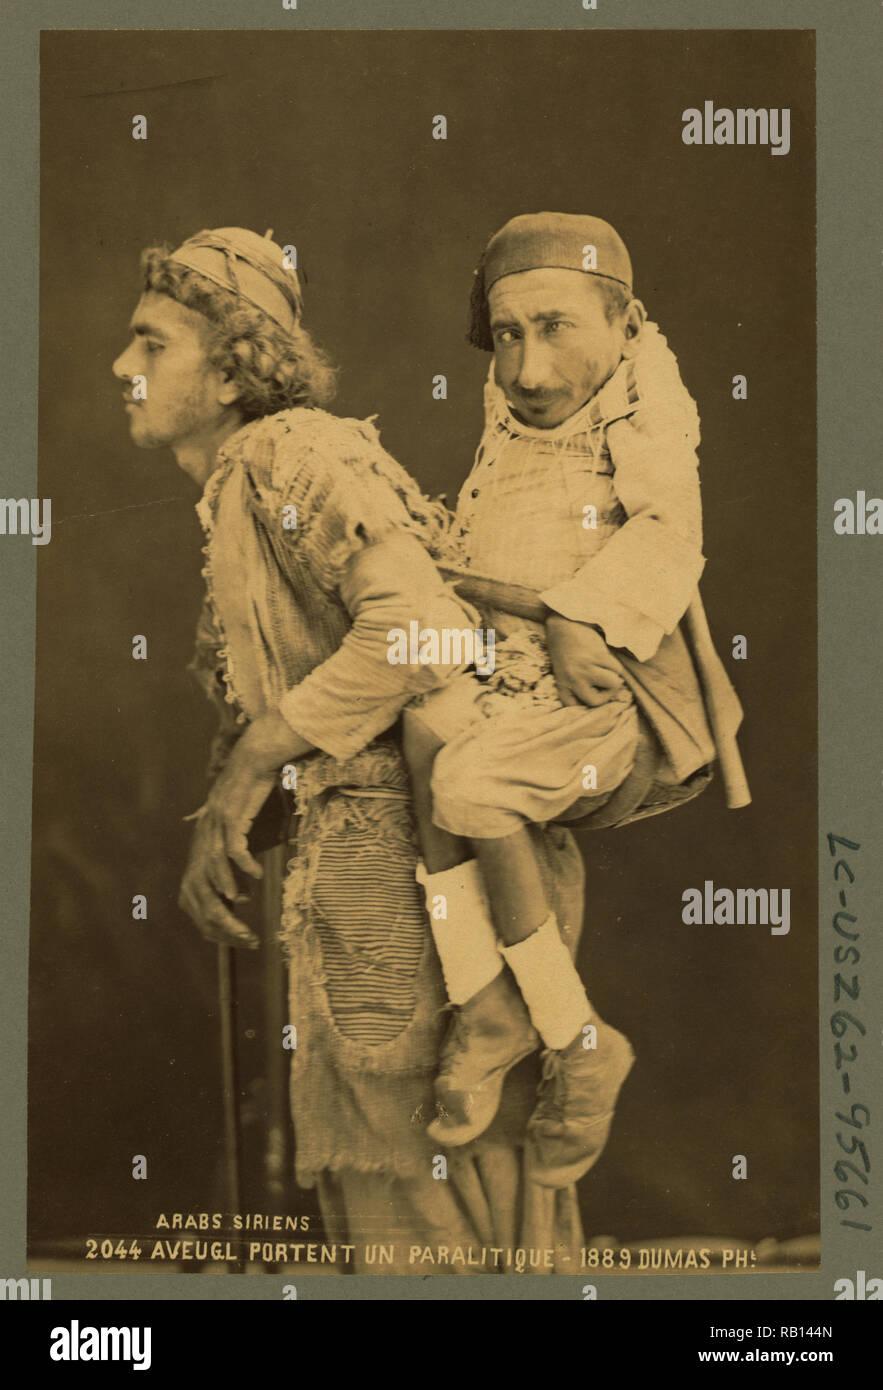 Arabs sirians  Blind bear a paralitic c1889 by Dumas, Tancrde R